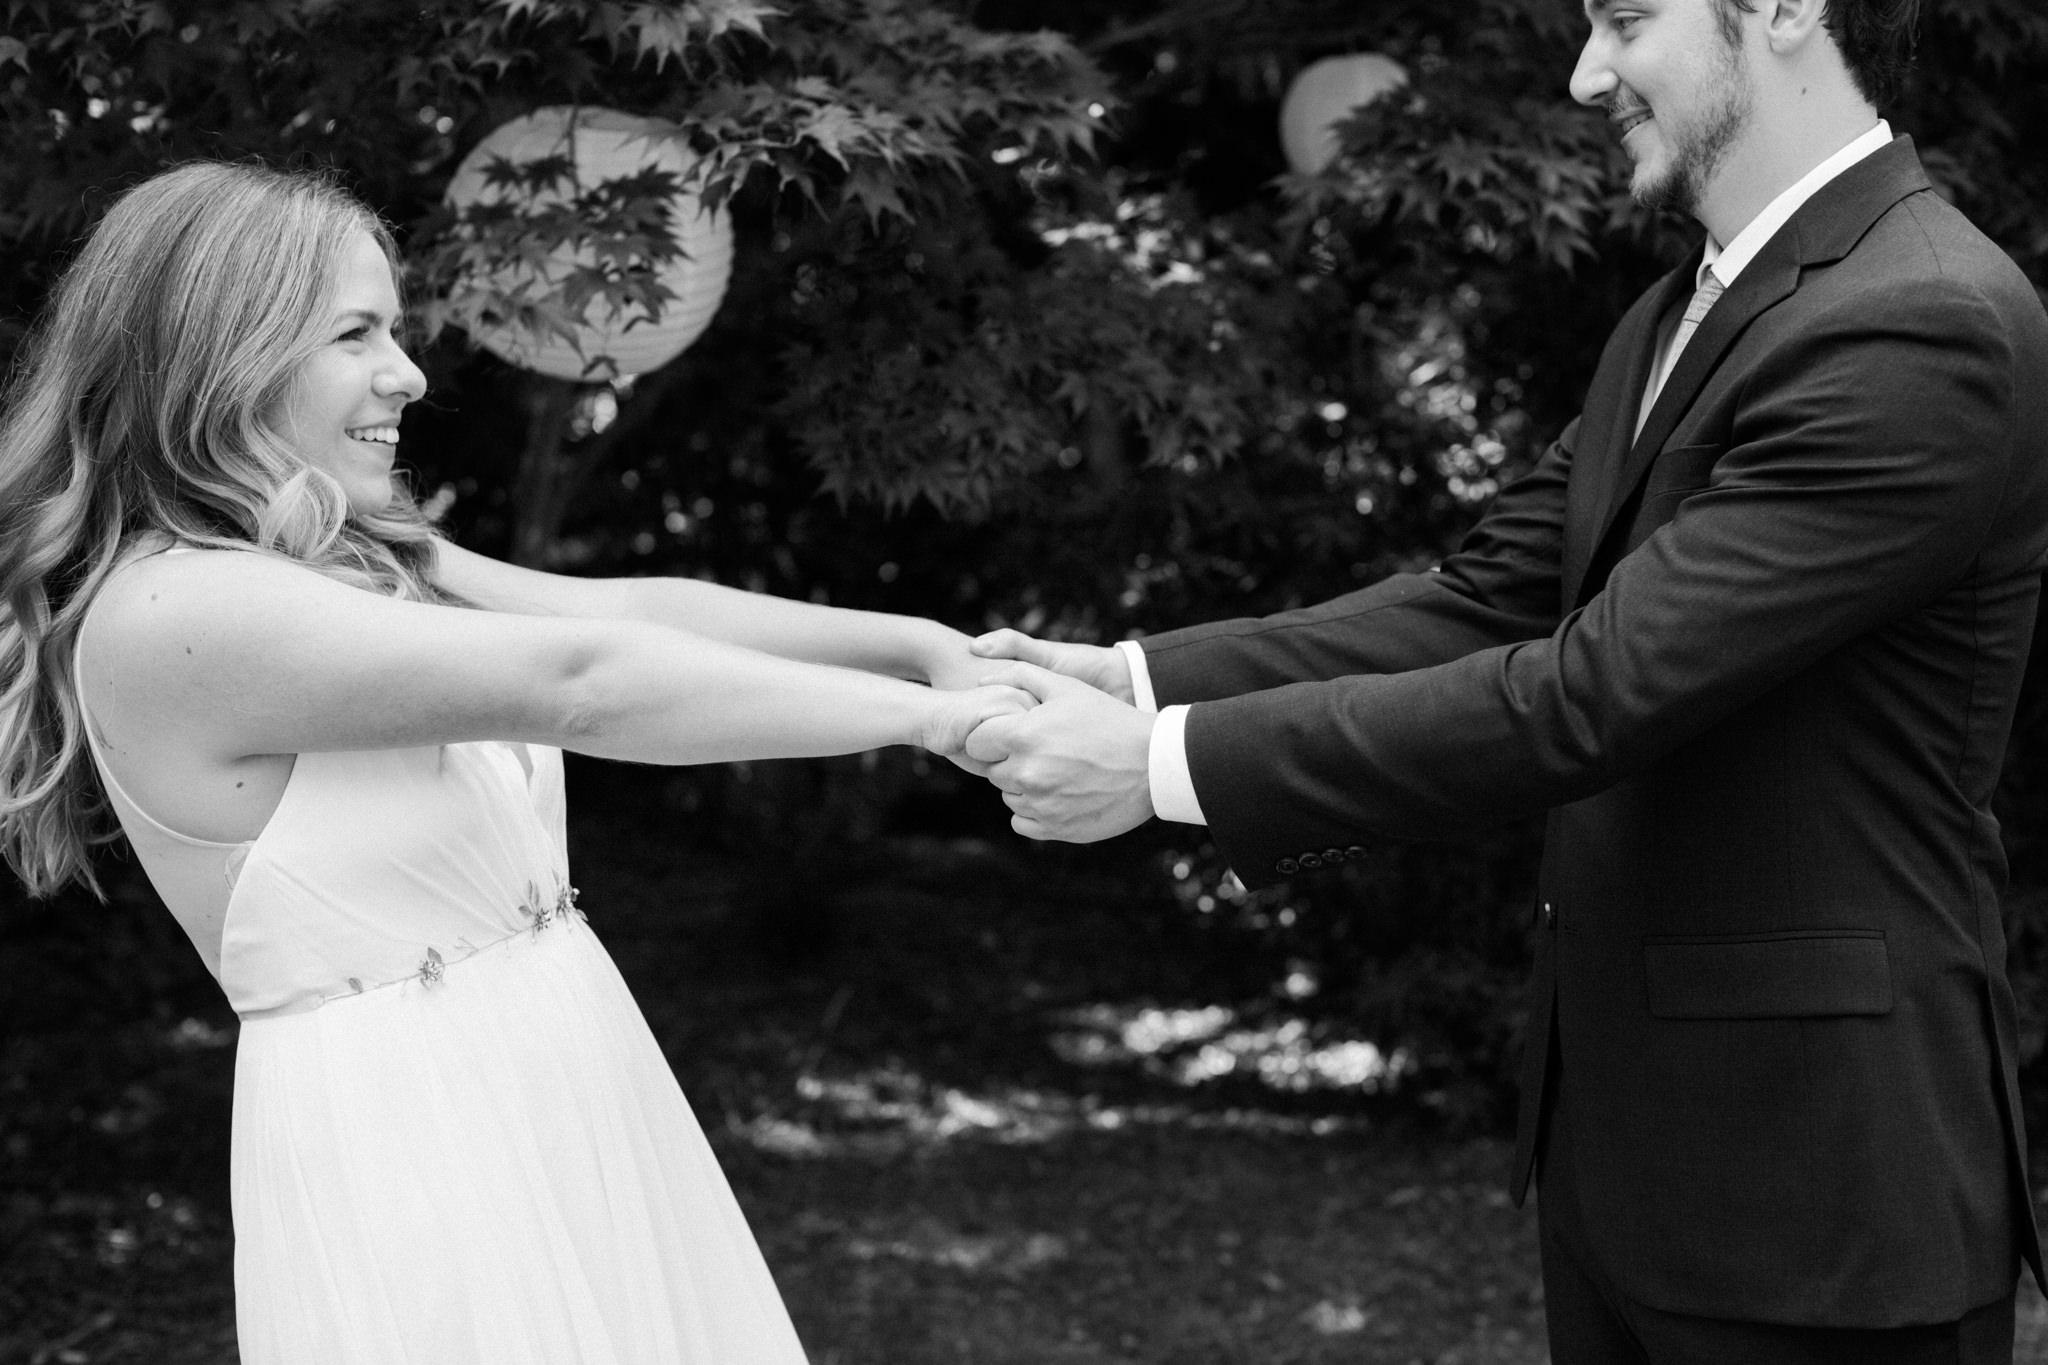 Backyard-Bainbridge-Island-Wedding-Alycia-Lovell-Photography-35.JPG